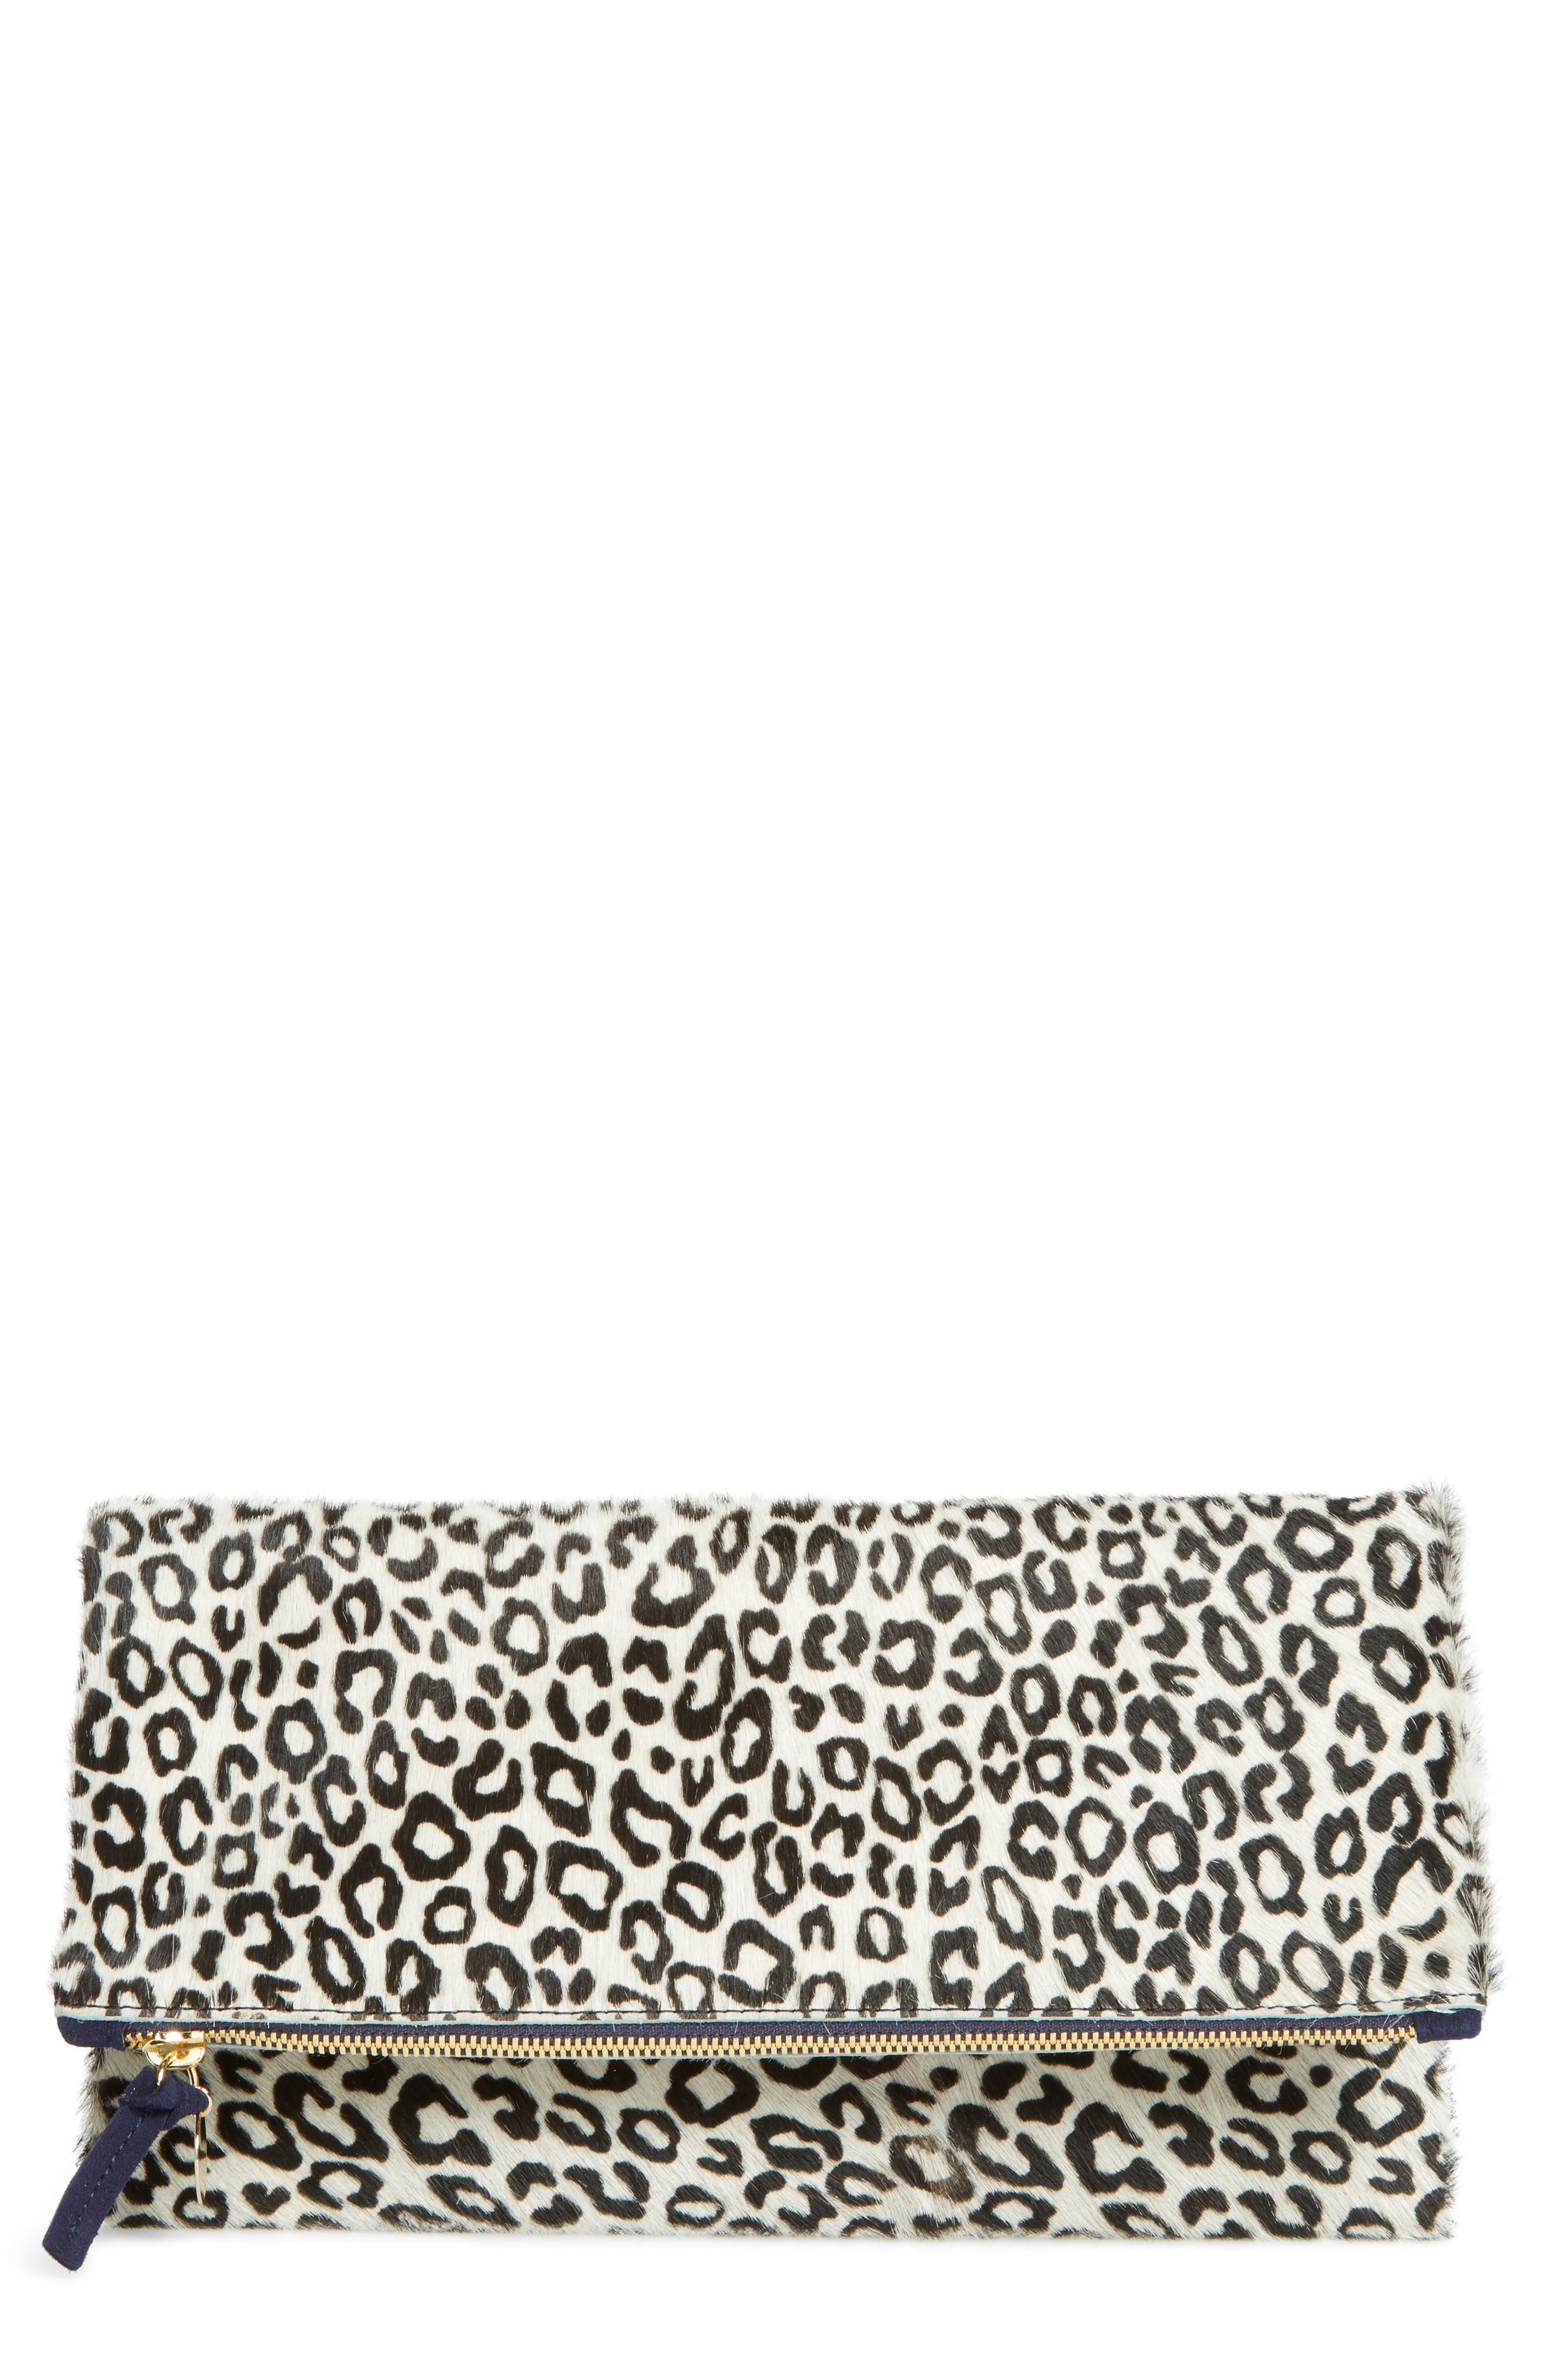 Ocelot Print Genuine Calf Hair Foldover Clutch,                         Main,                         color, 001